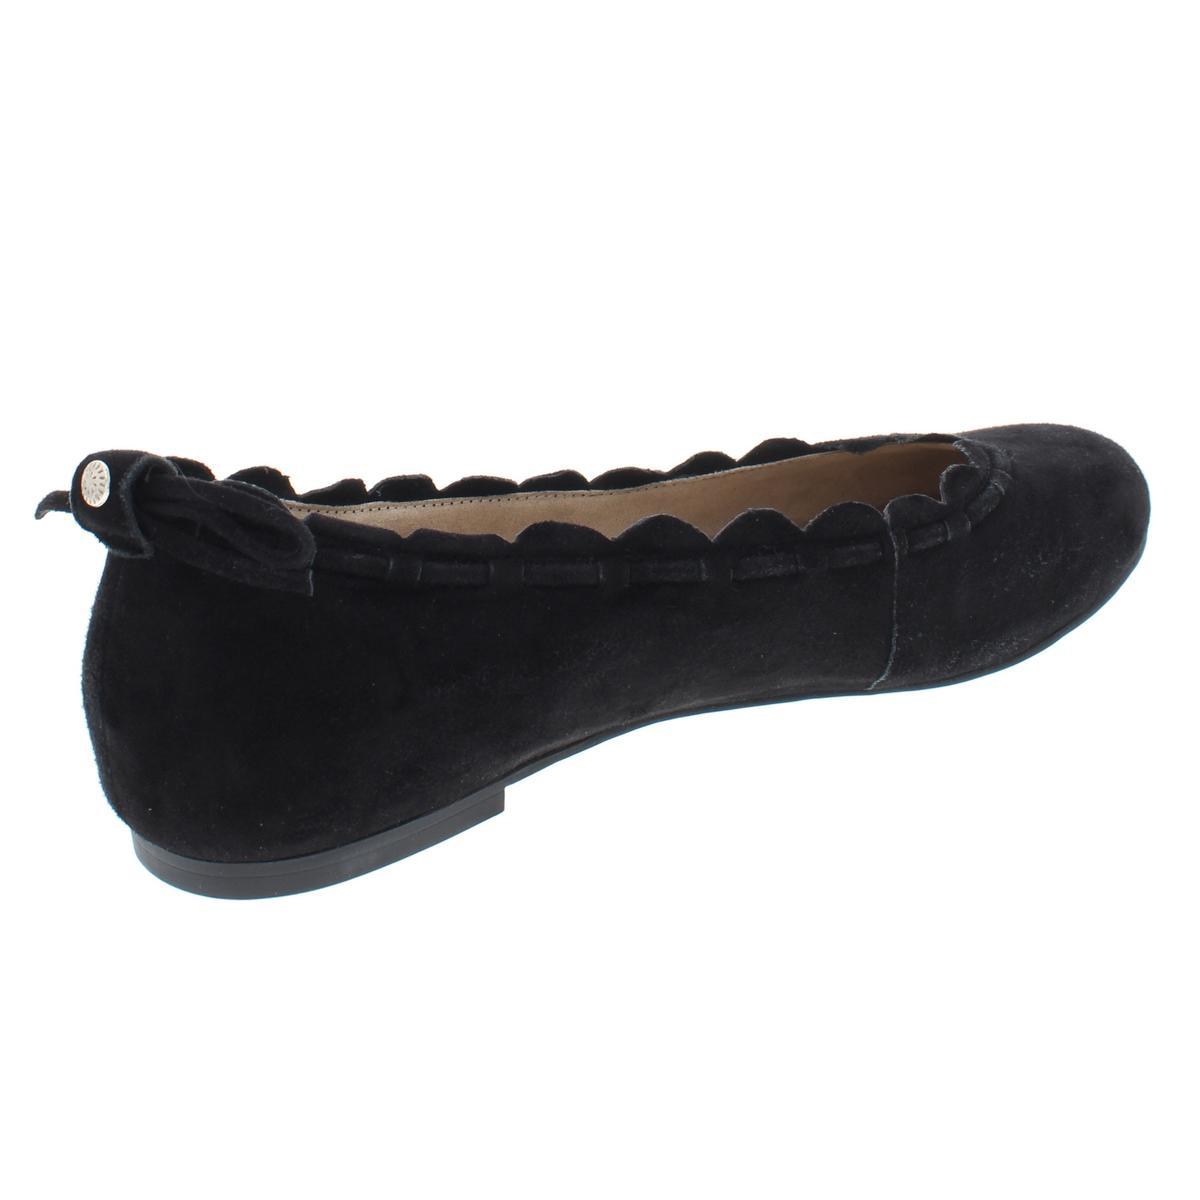 Jack-Rogers-Womens-Lucie-Suede-Flats-Trim-Casual-Shoes-Shoes-BHFO-8002 thumbnail 4